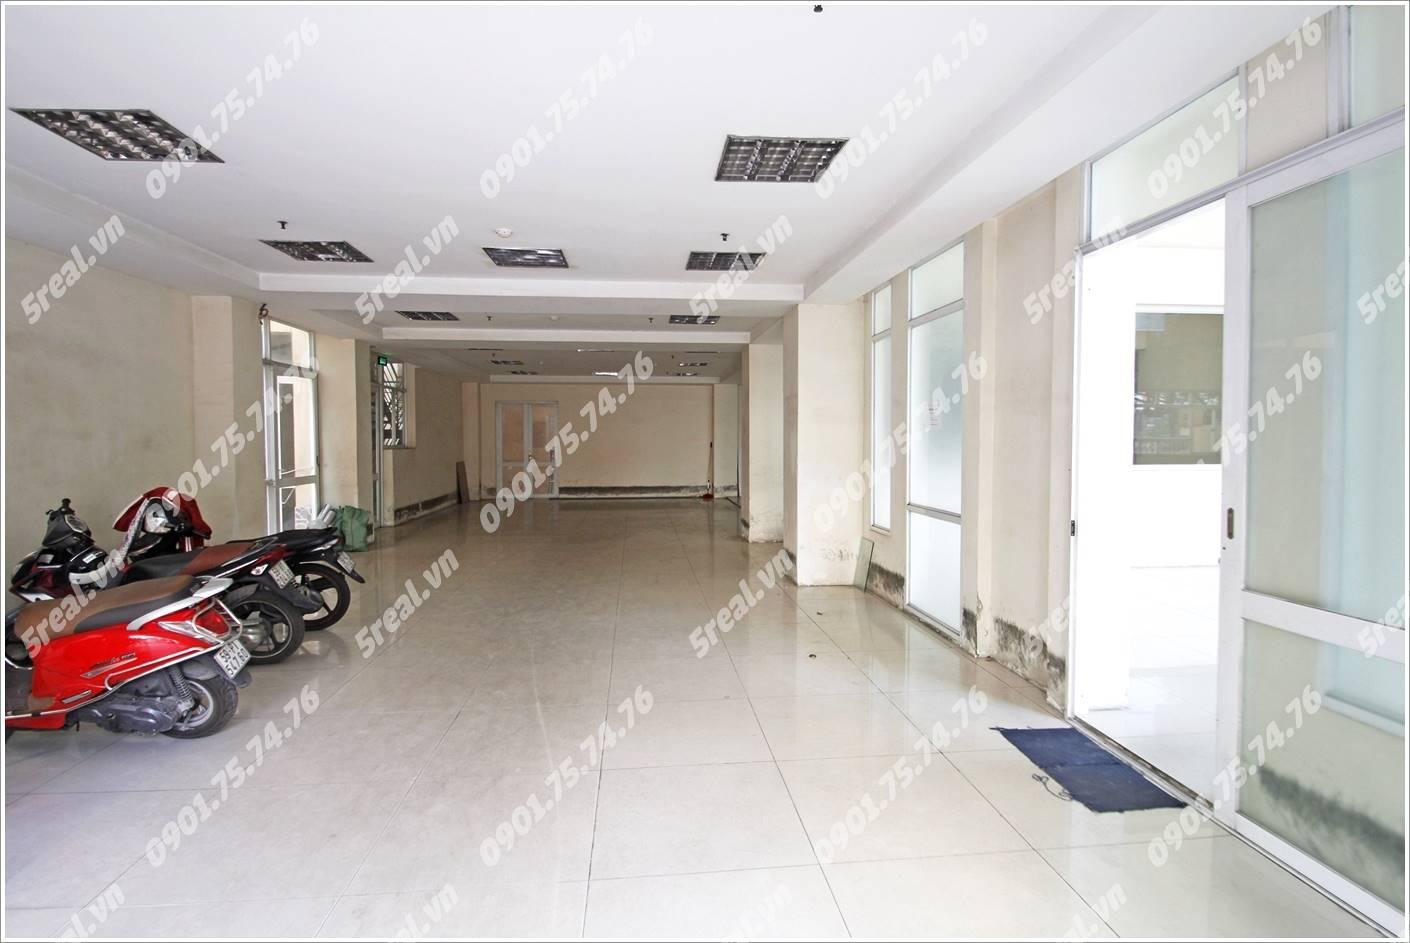 halo-le-trung-nghia-building-quan-tan-binh-van-phong-cho-thue-5real.vn-02